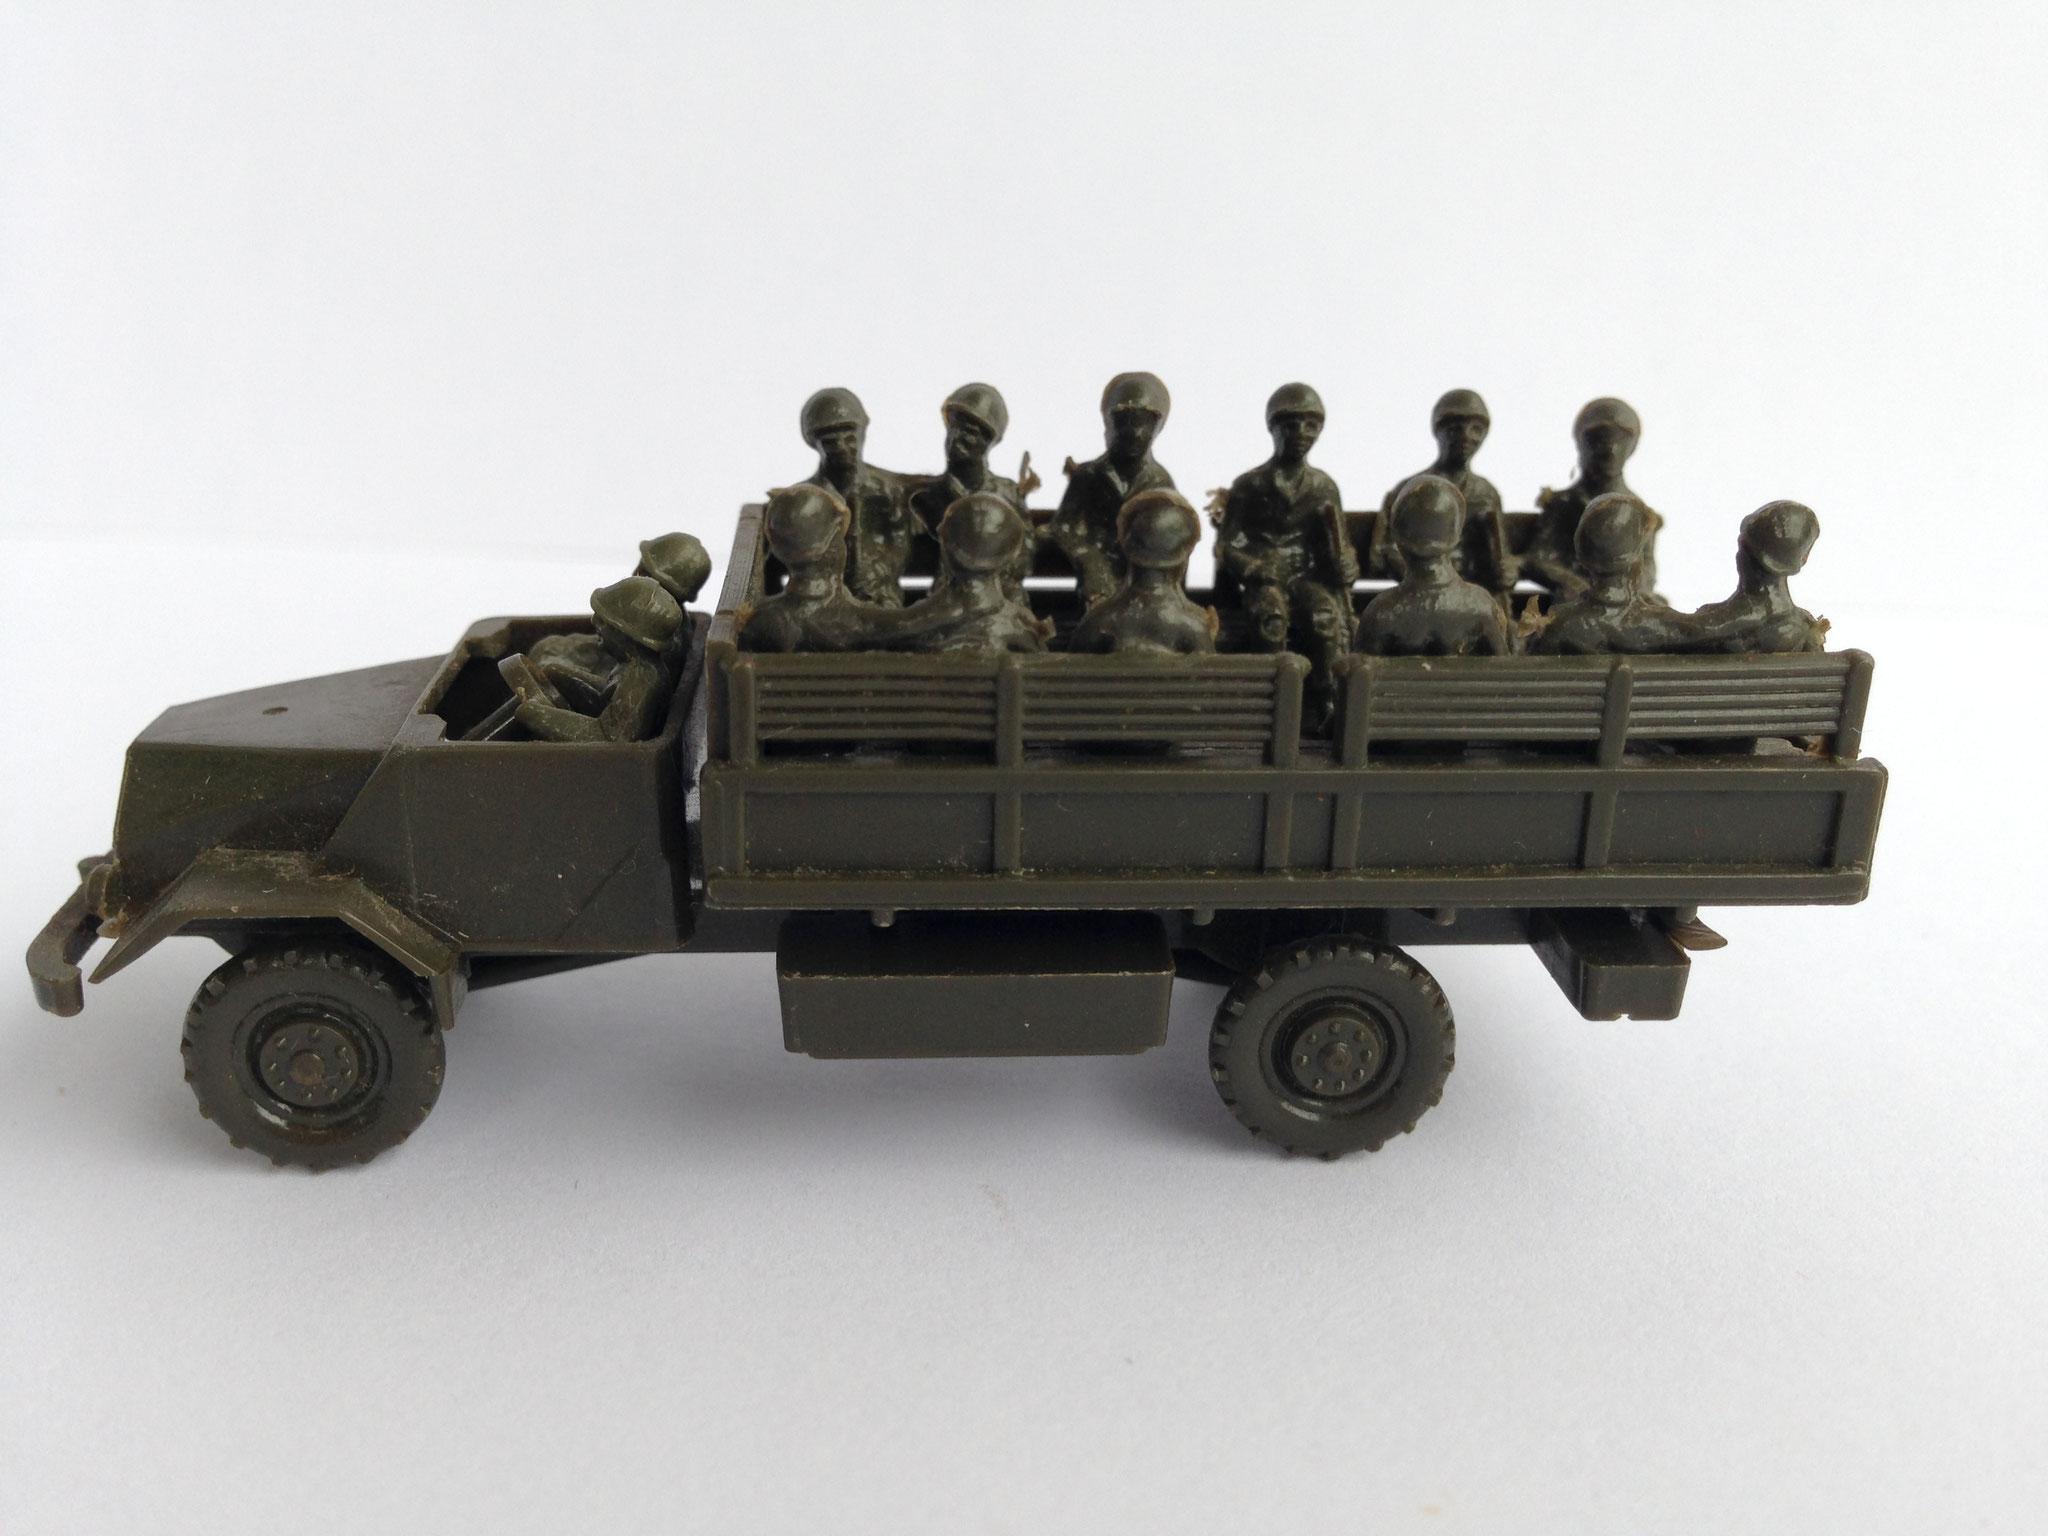 Ford 3t mit 14 Figuren, Art. Nr. 141 B (ab 1961/62 im Programm)